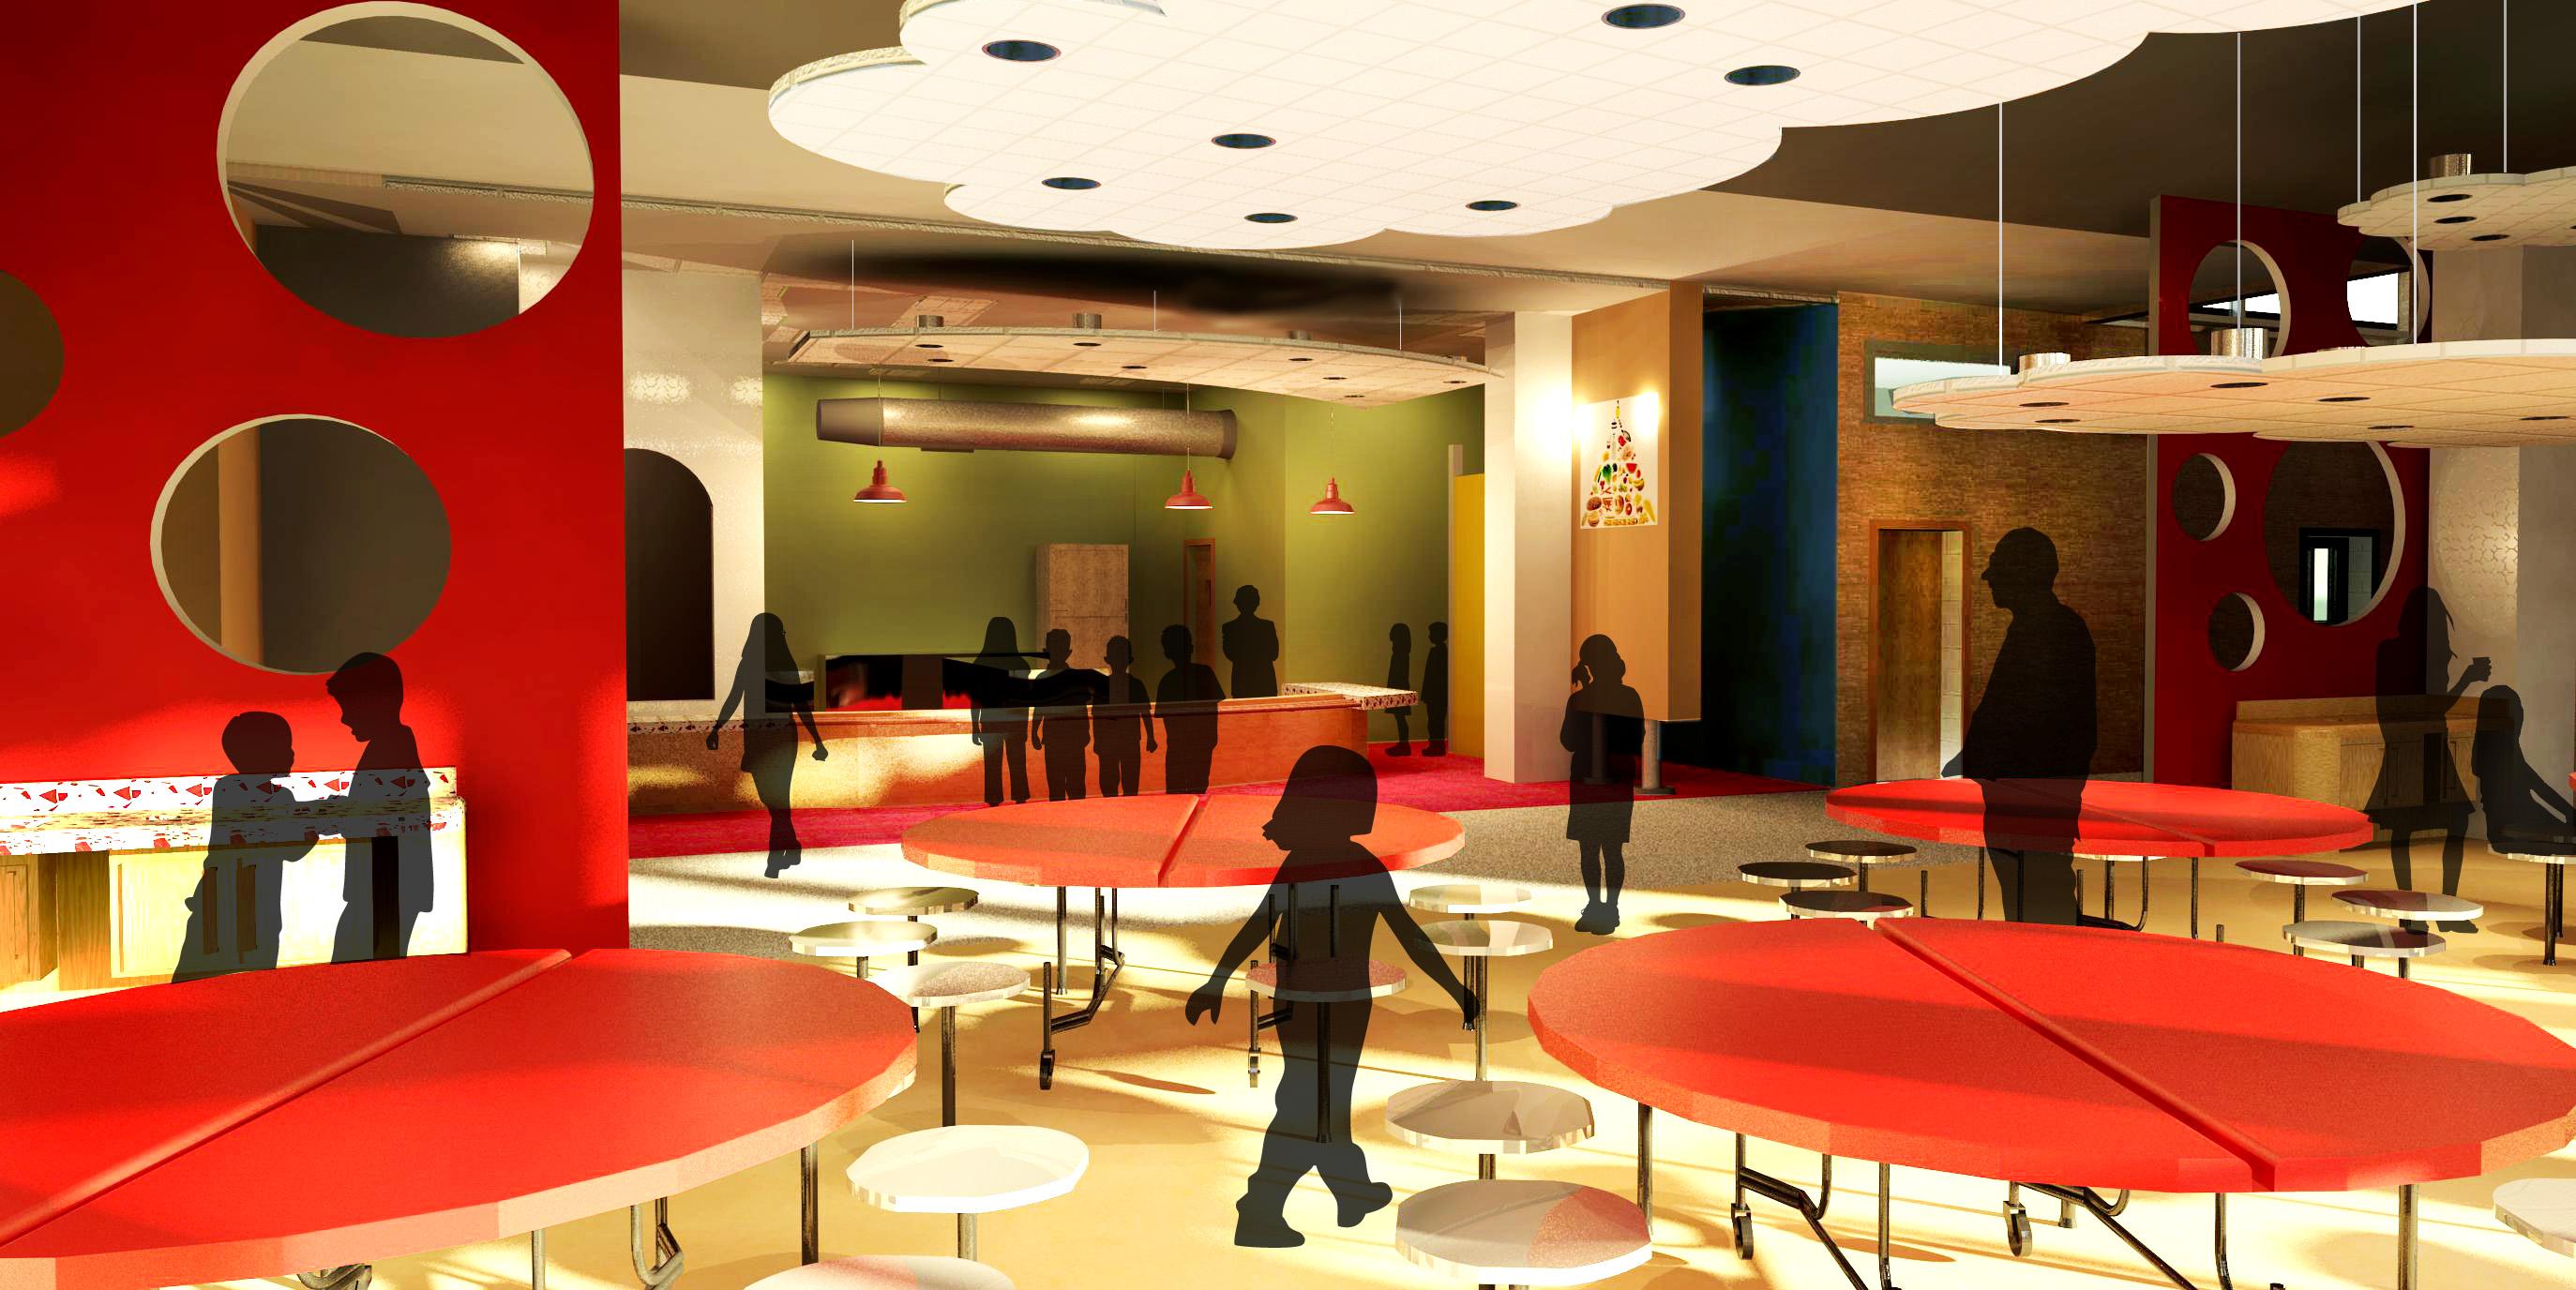 Elementary School Cafeteria Design images